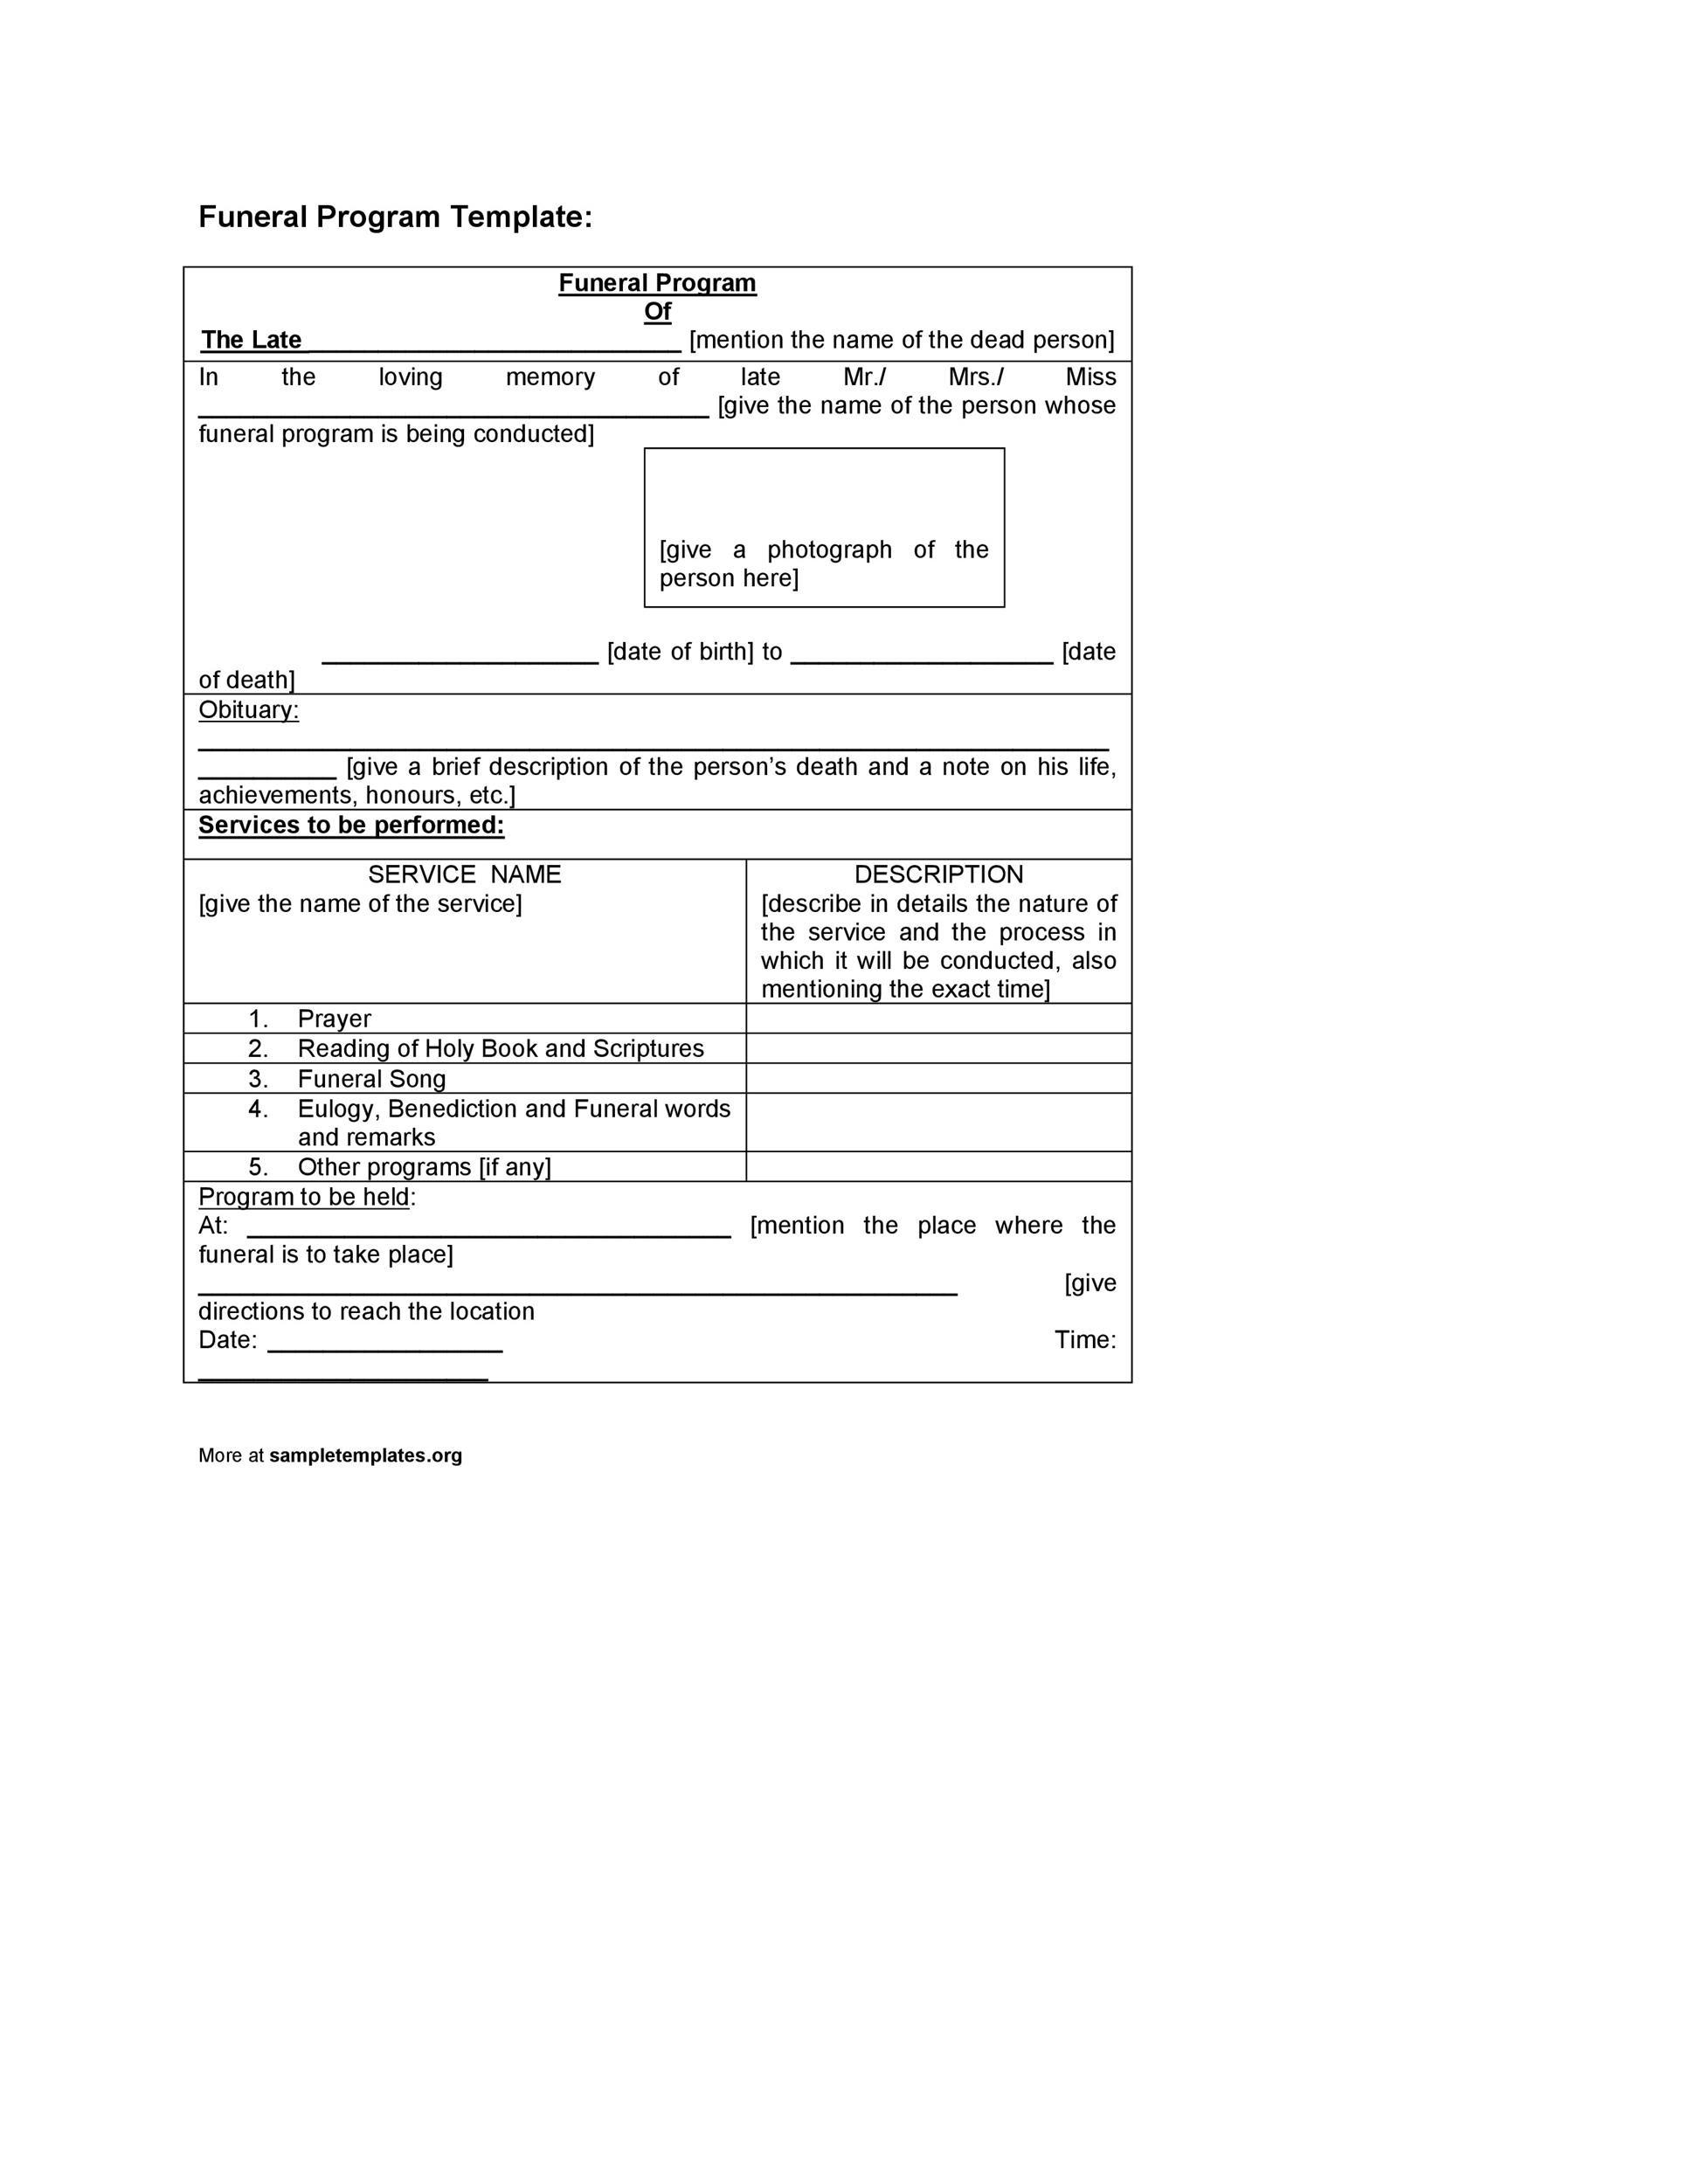 Free funeral program template 09